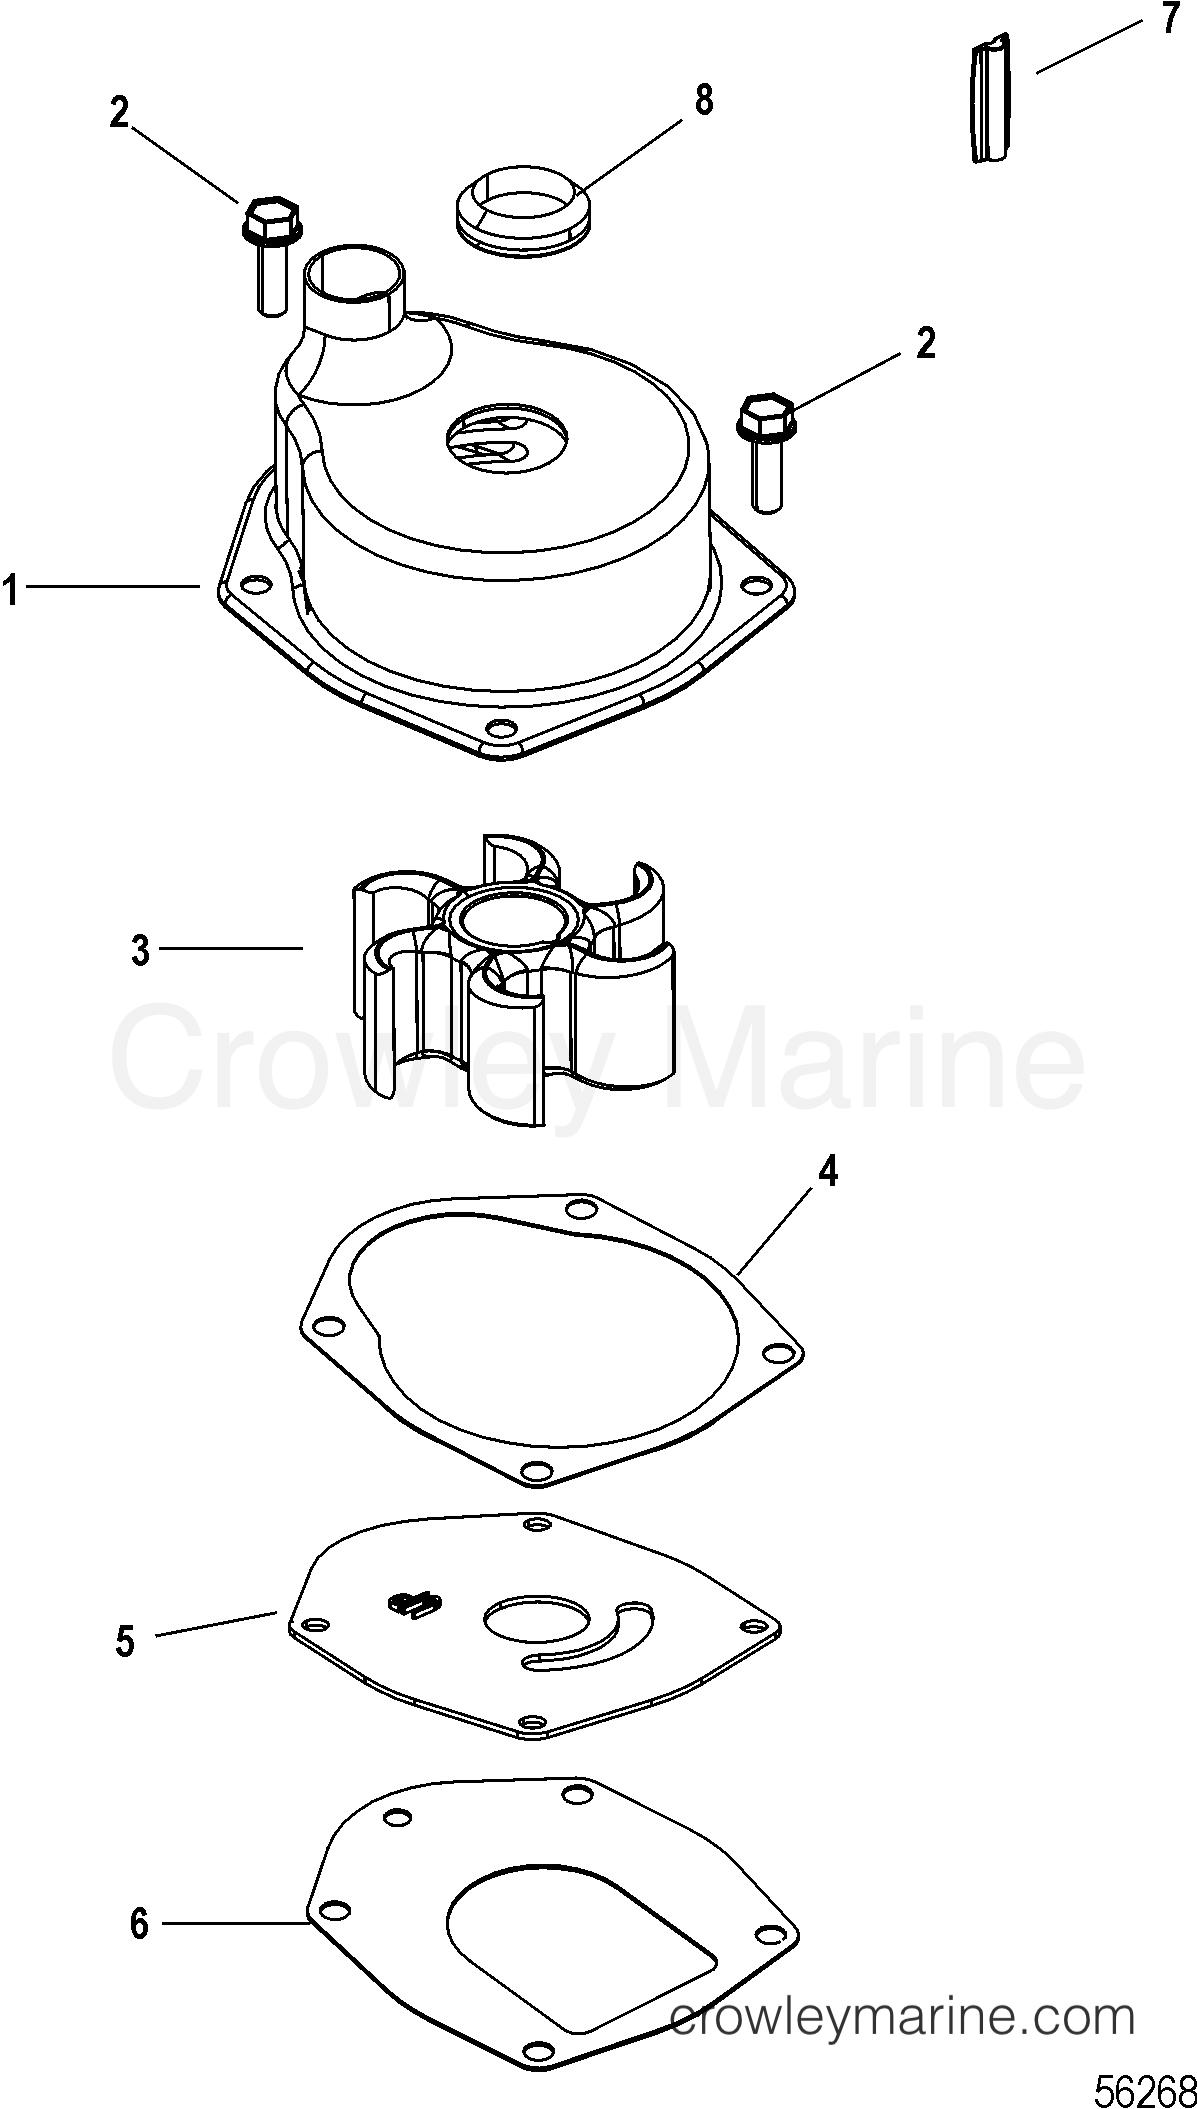 2014 Mariner Outboard 100EFI [ELPT 4] - 7100F131F - WATER PUMP KIT, JET section